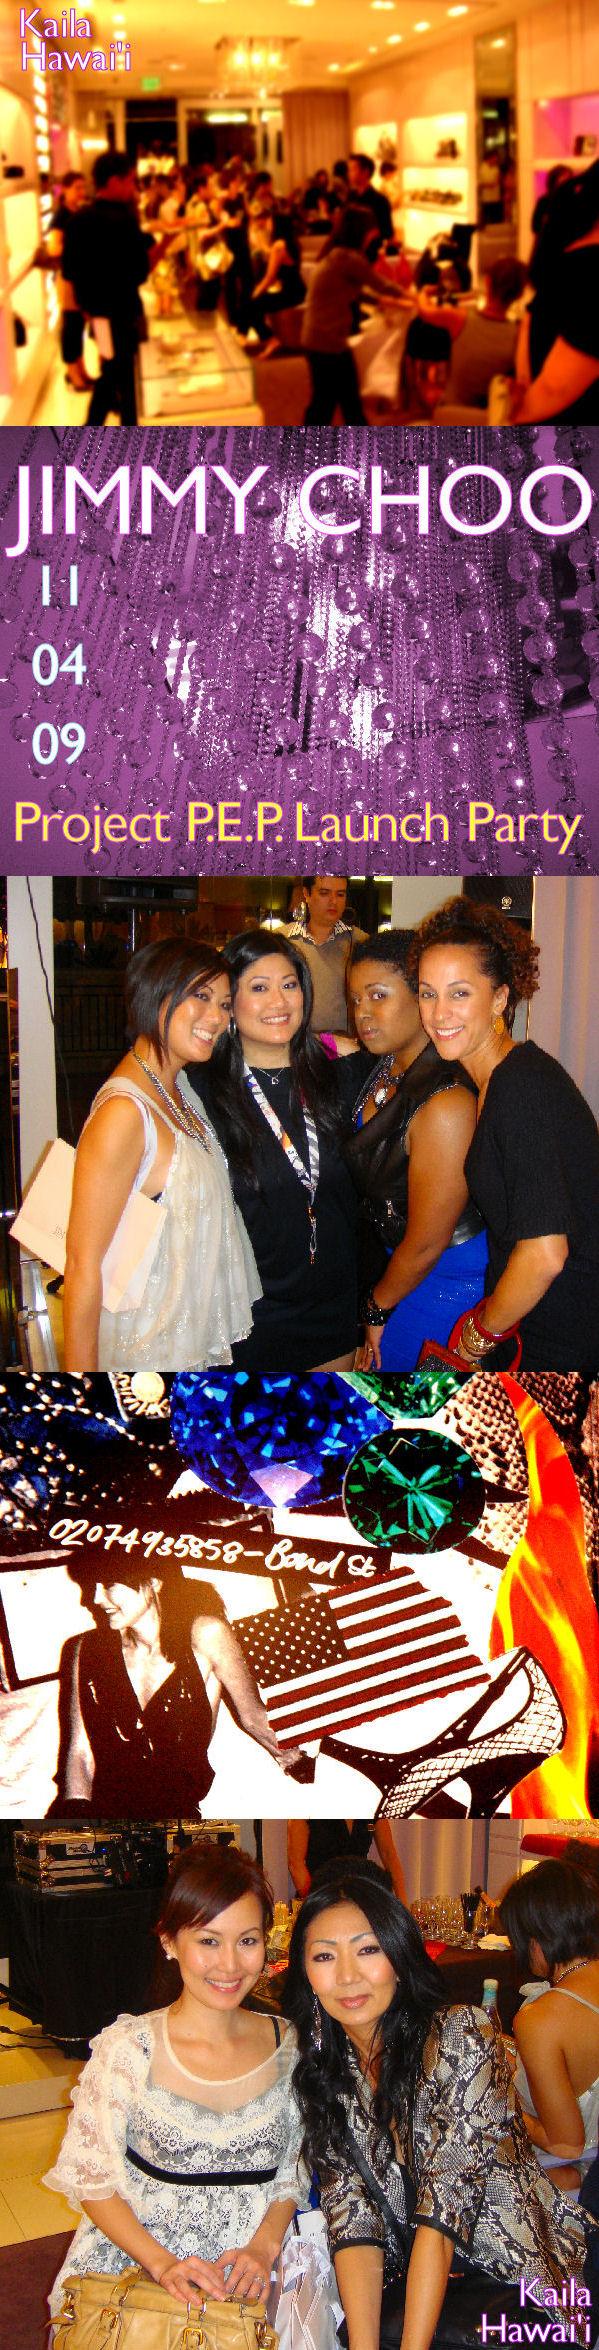 Jimmy Choo Project P.E.P Launch Party - Honolulu